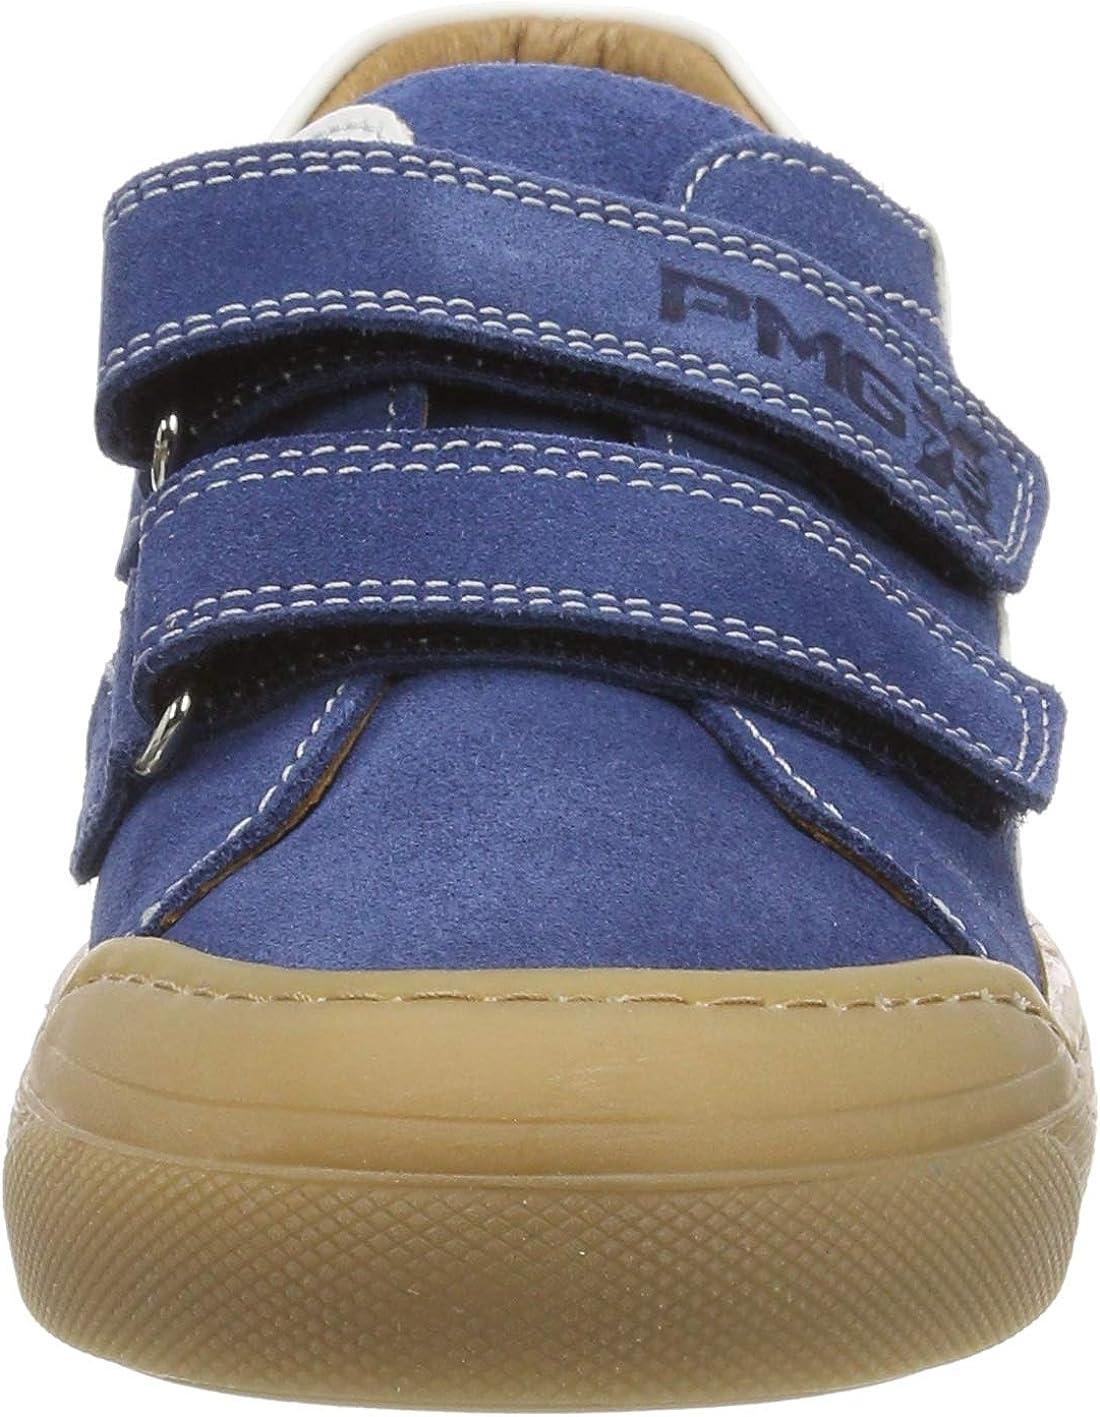 Primigi Boys/' Ptm 34239 Low-Top Sneakers